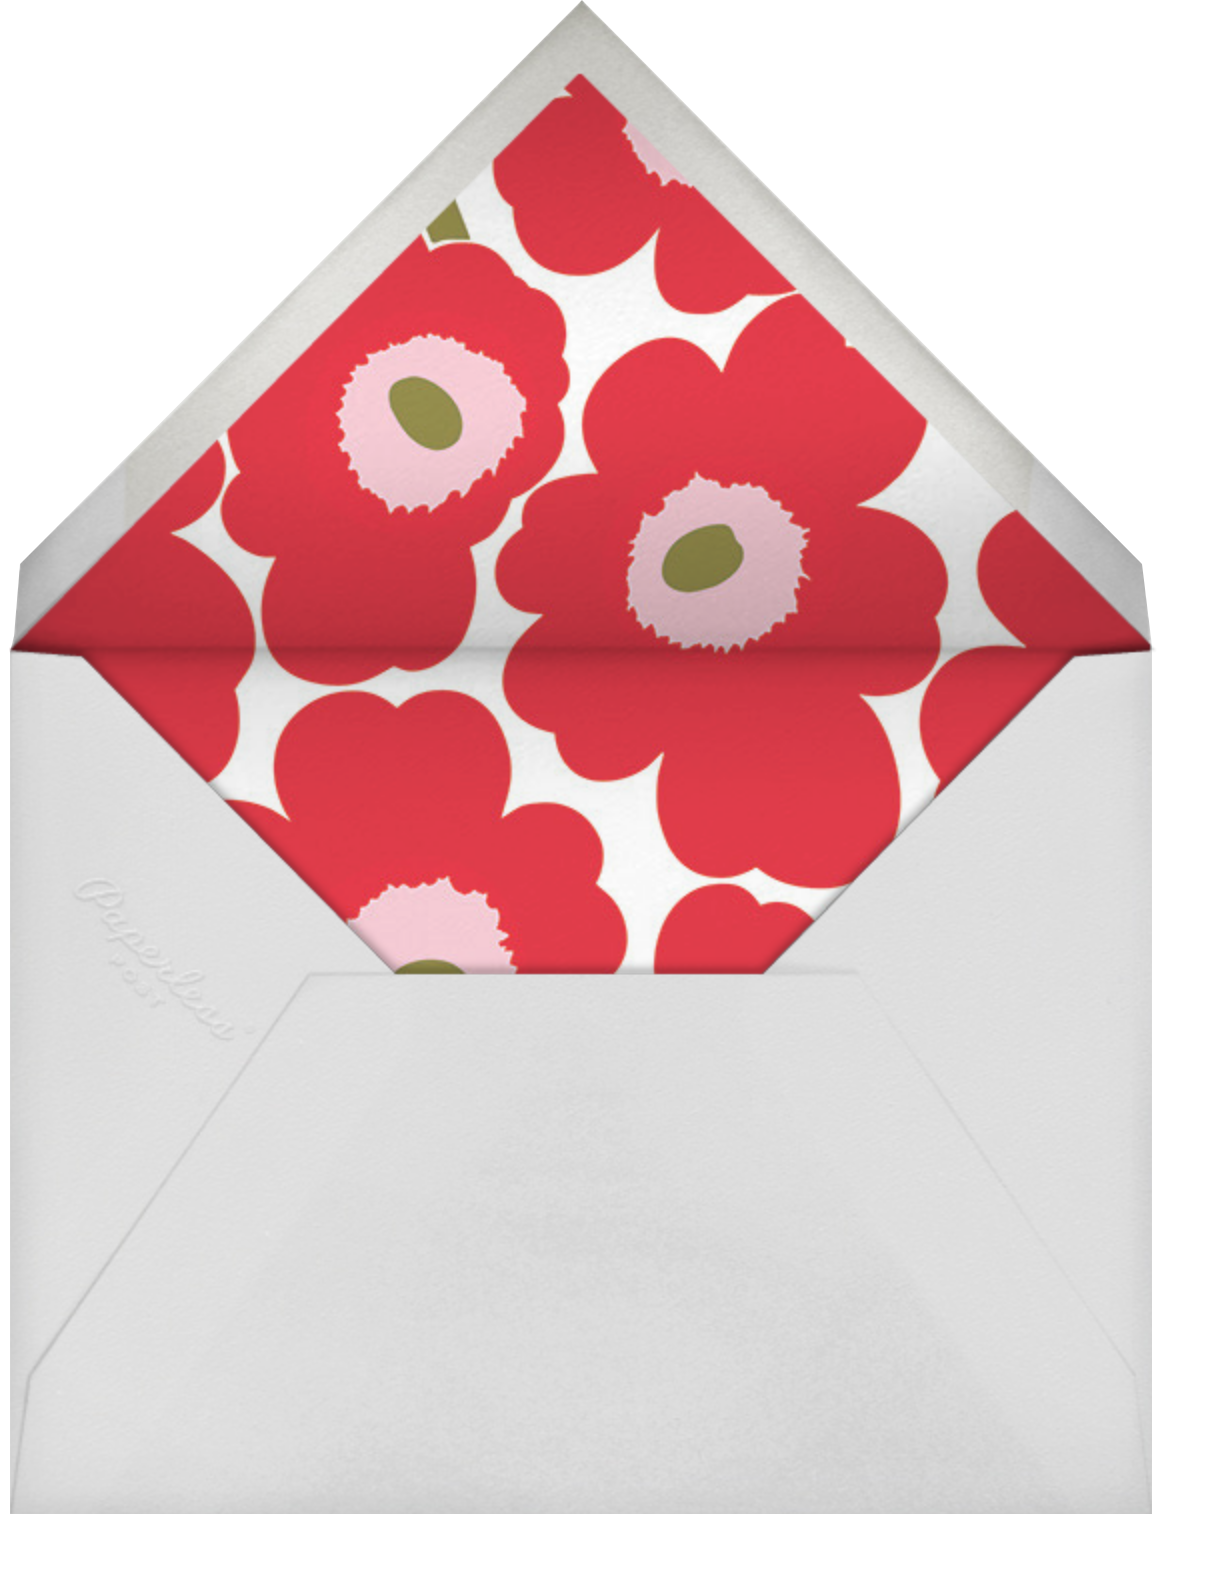 Unikko (Photo) - Red/Green - Marimekko - null - envelope back